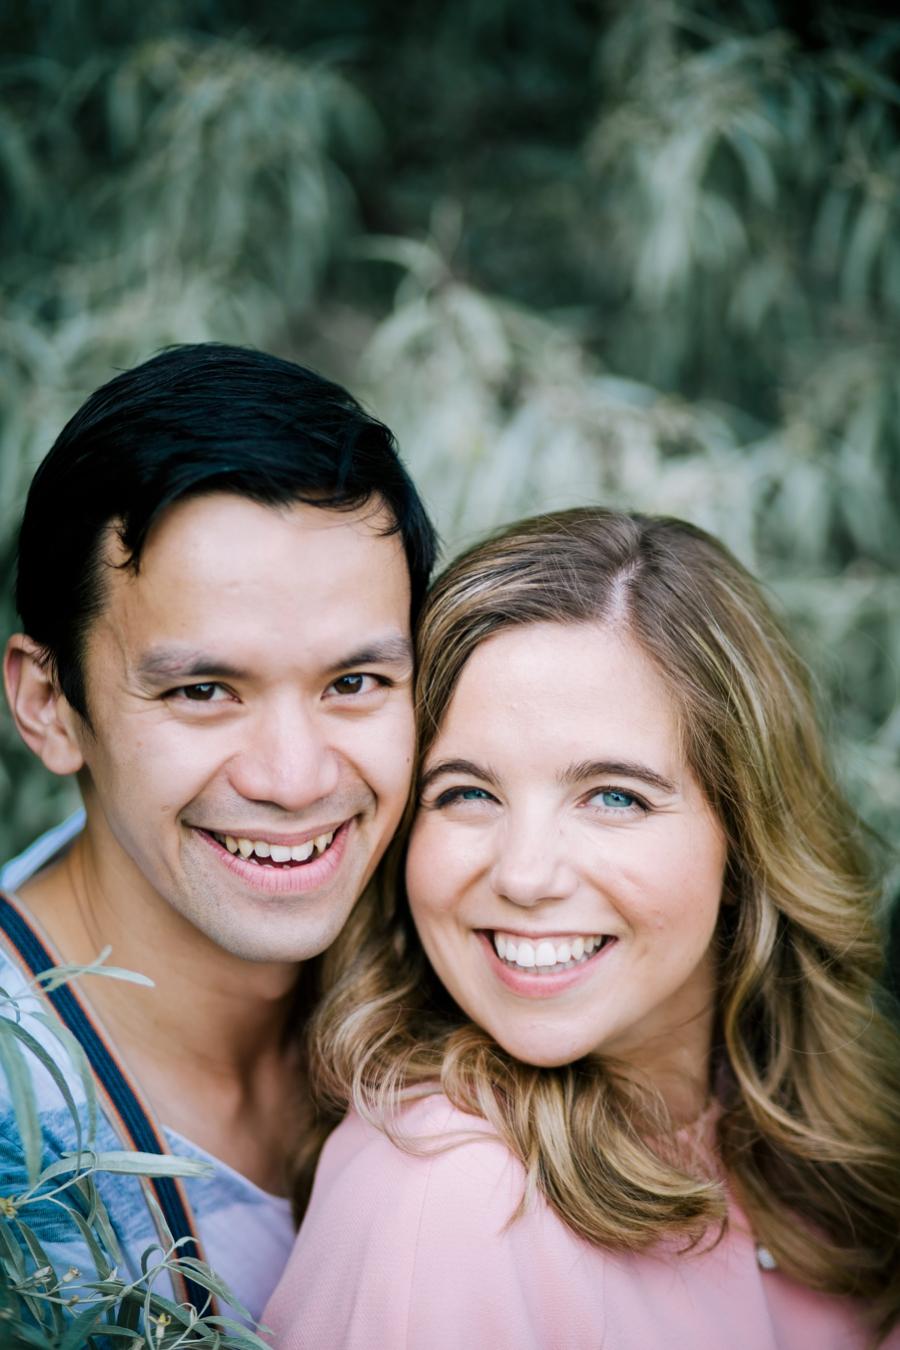 Somerset wedding photographer Olivia and Paul engagement shoot 13